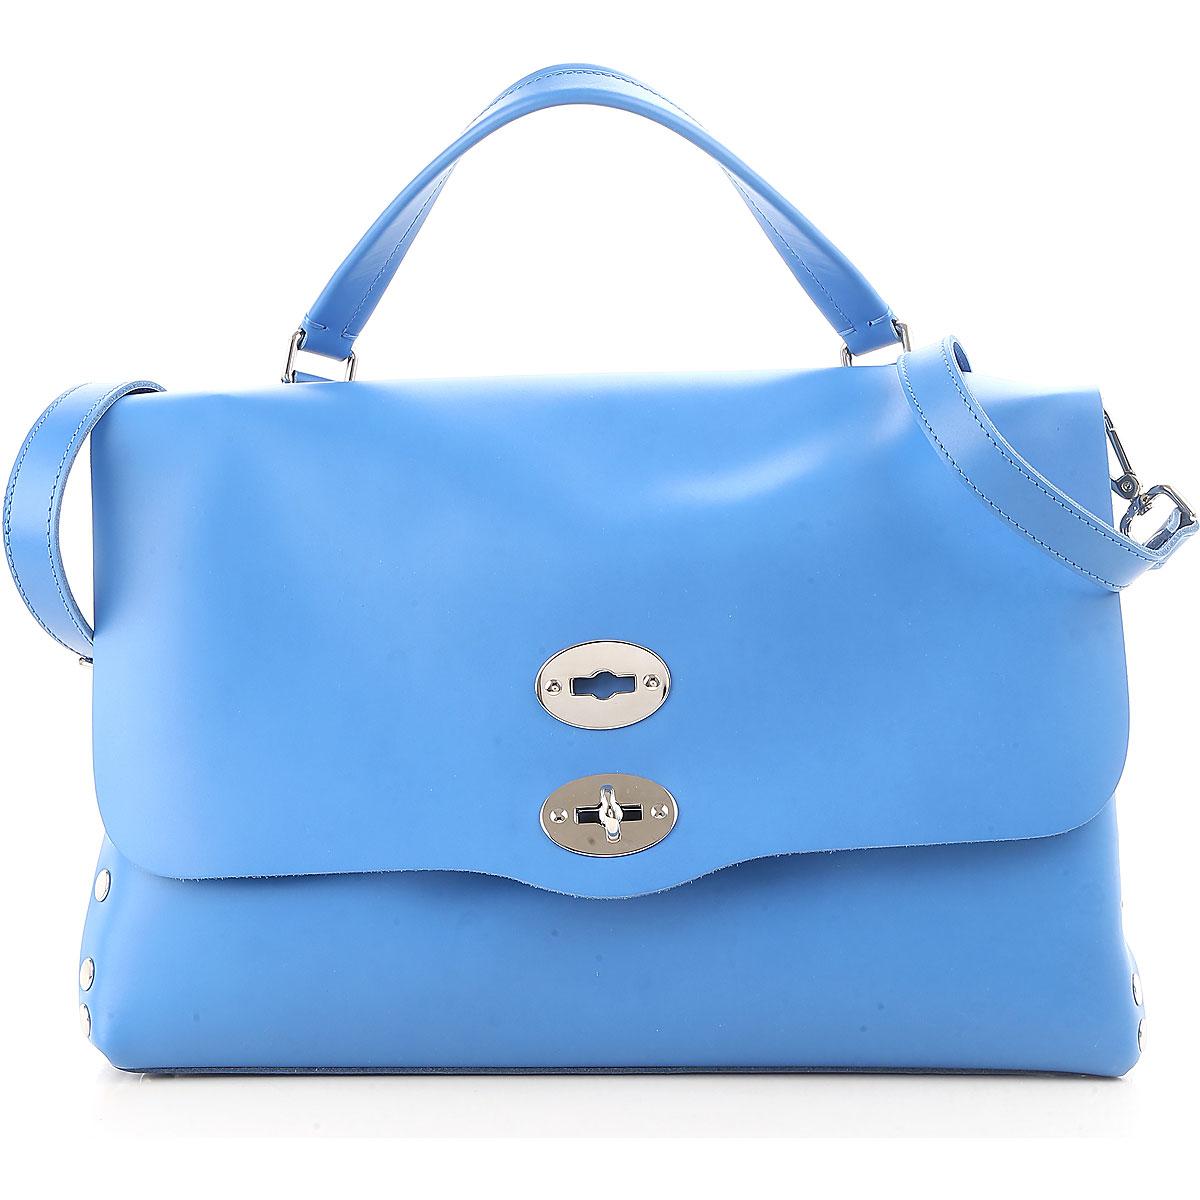 Image of Zanellato Handbags On Sale, Postina M, Blue, Leather, 2017